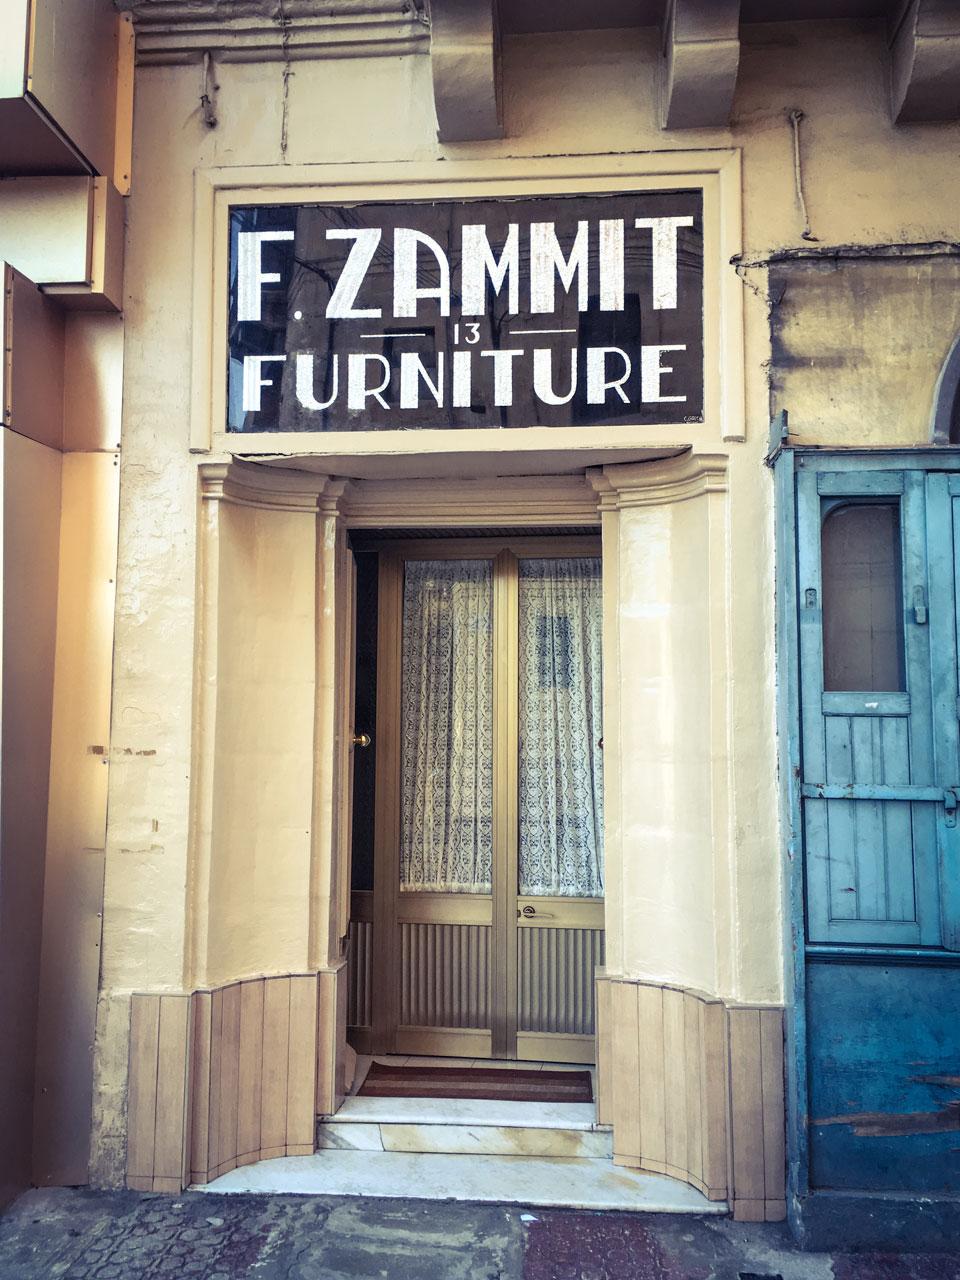 disappearingMalta - F.Zammit Furniture, Triq Hal Qormi, Hamrun, Malta - vintage storefront ©Helen Jones-Florio photography prints